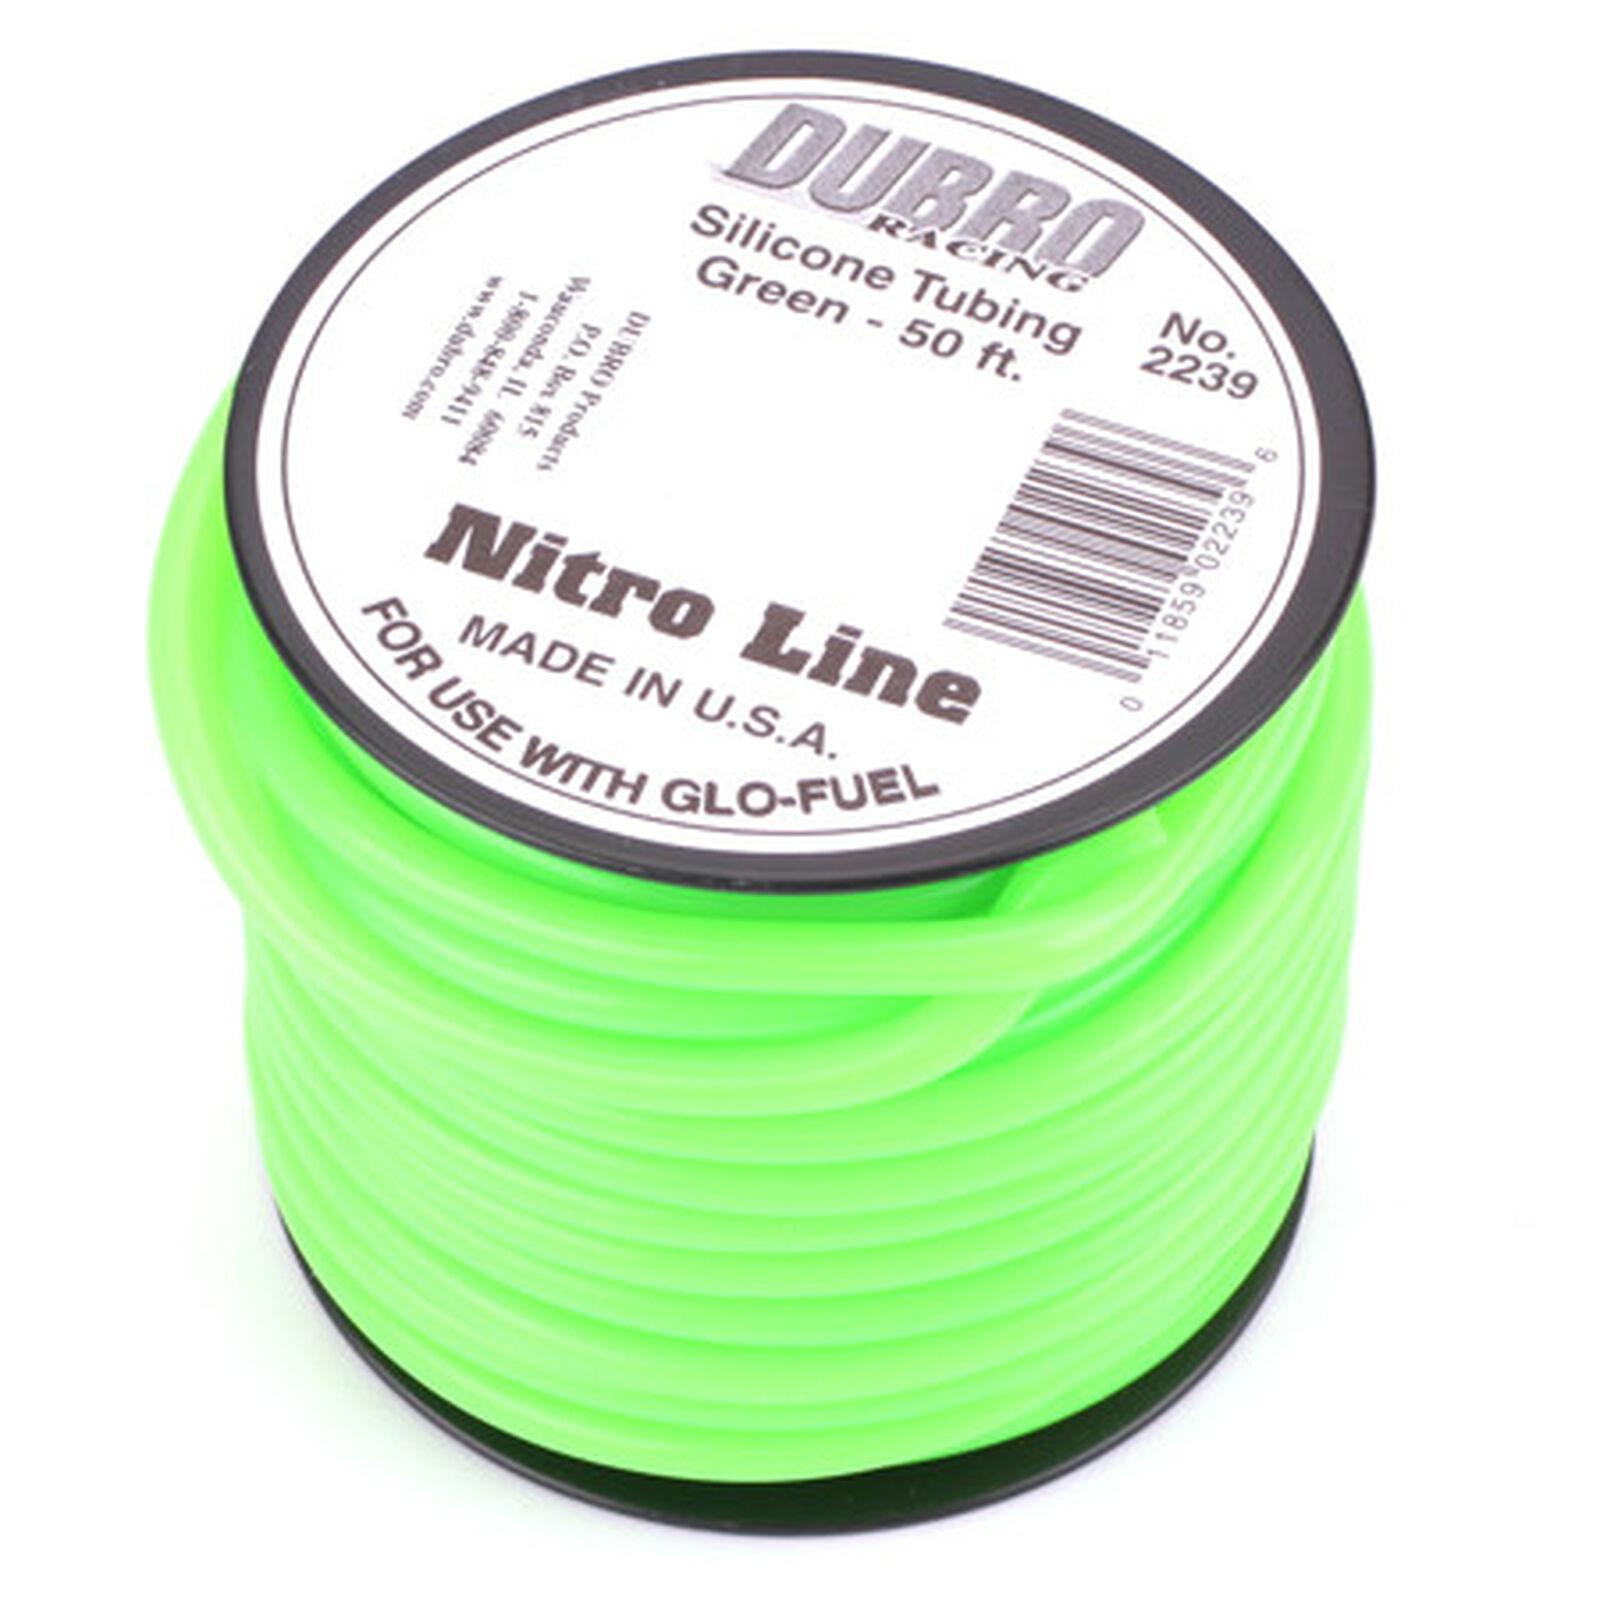 Silicone 50' Fuel Tubing, Green